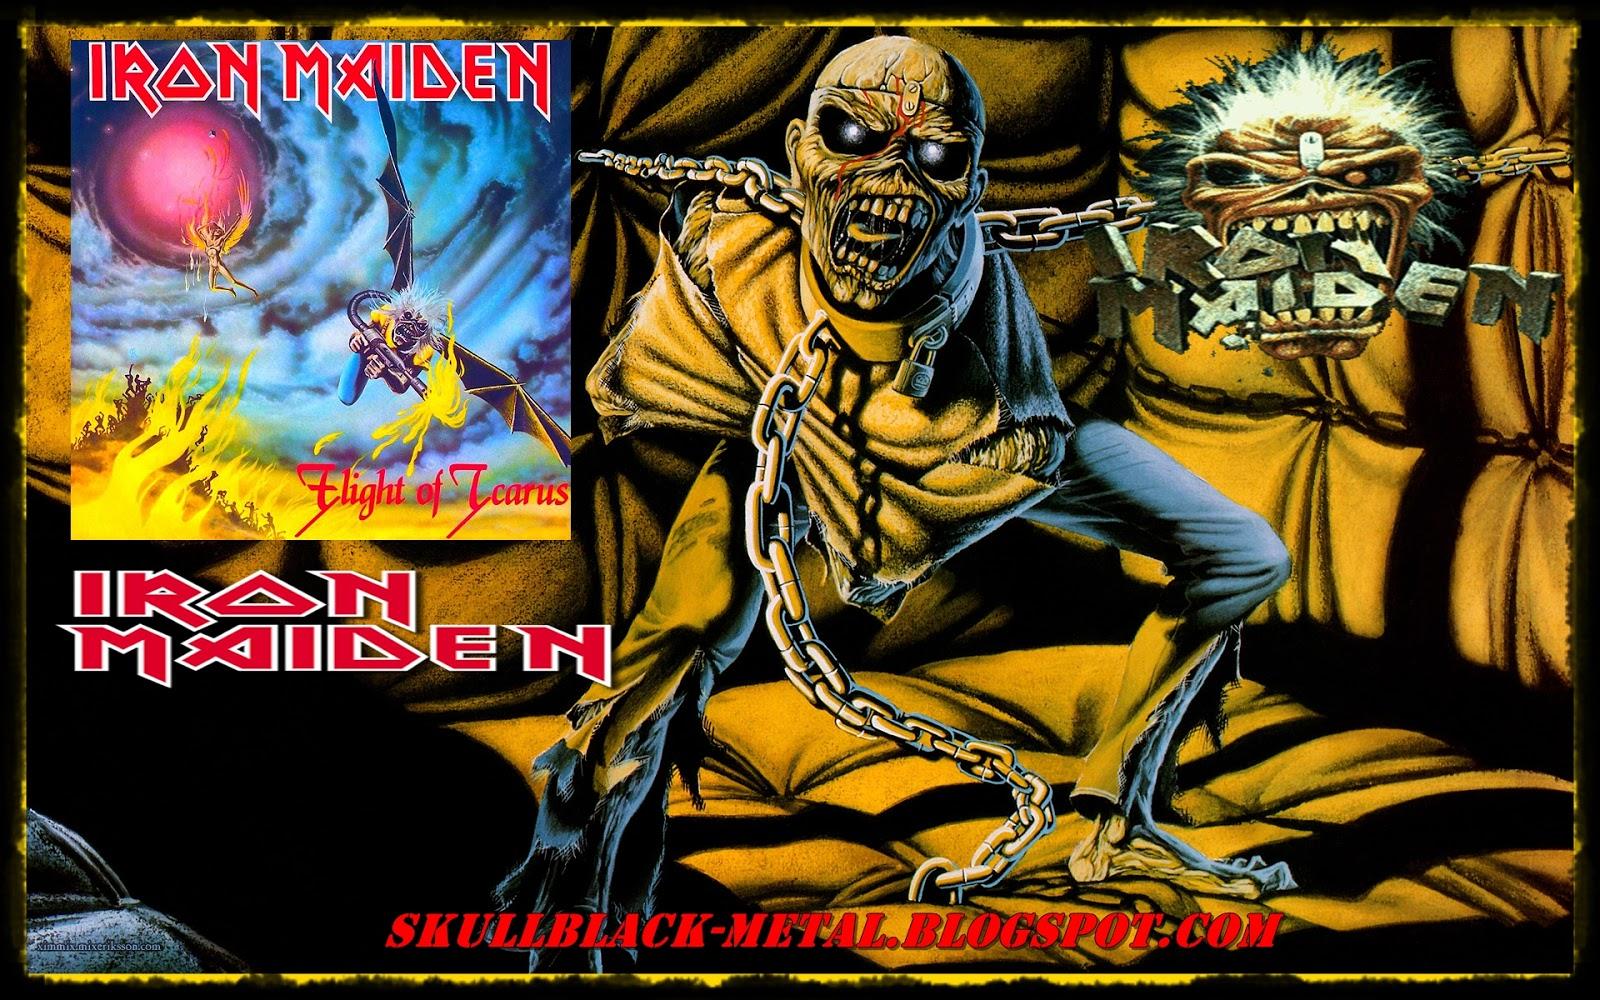 Skullblack metal iron maiden flight of icarus 1983 single